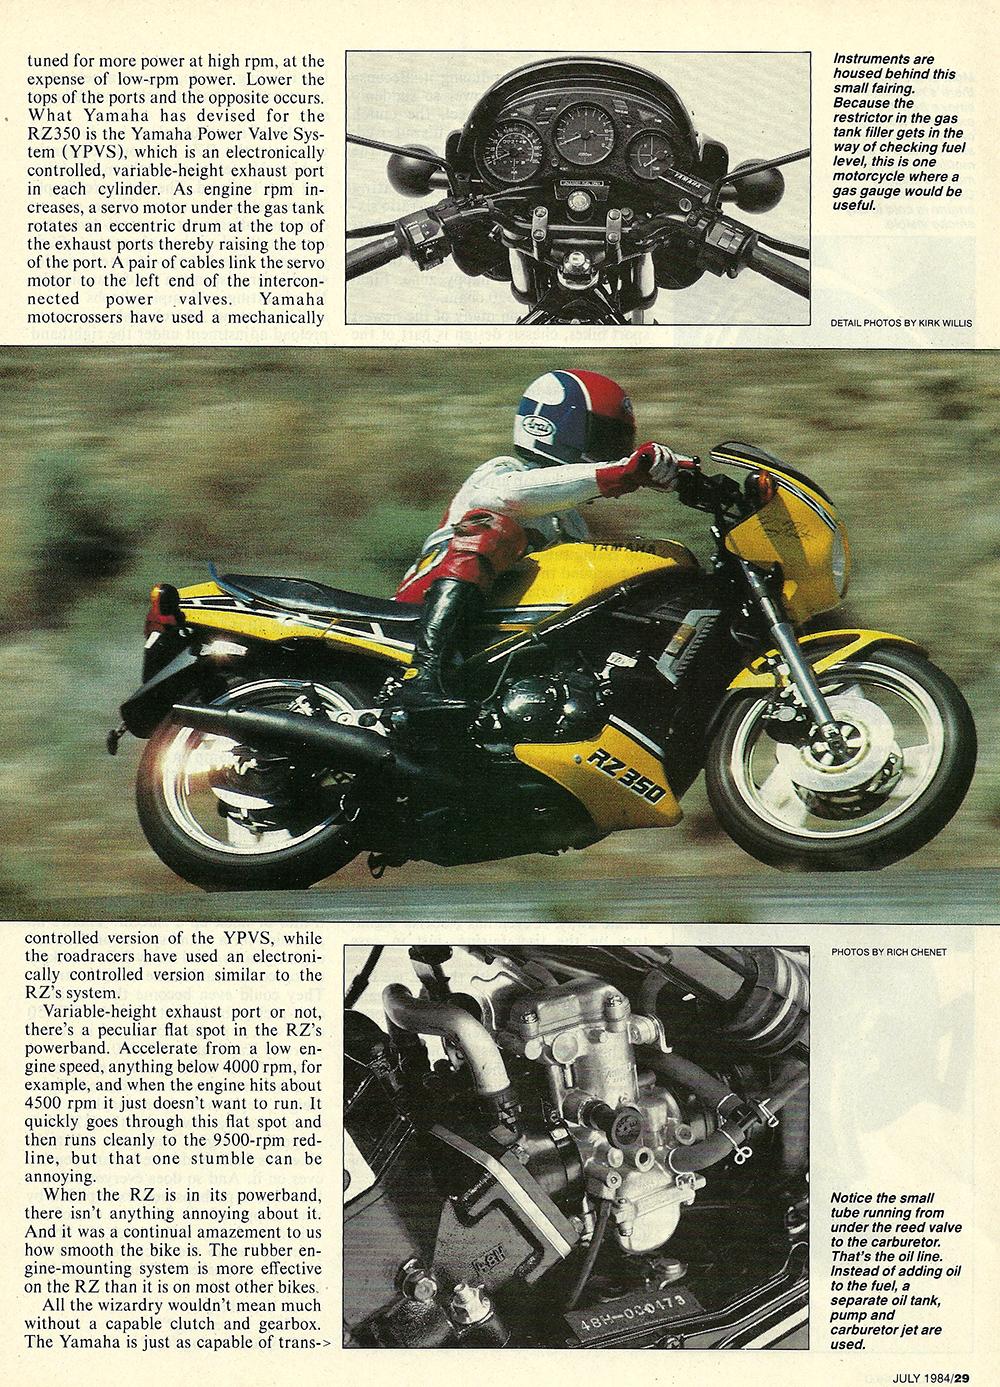 1984 Yamaha RZ350 road test 04.jpg